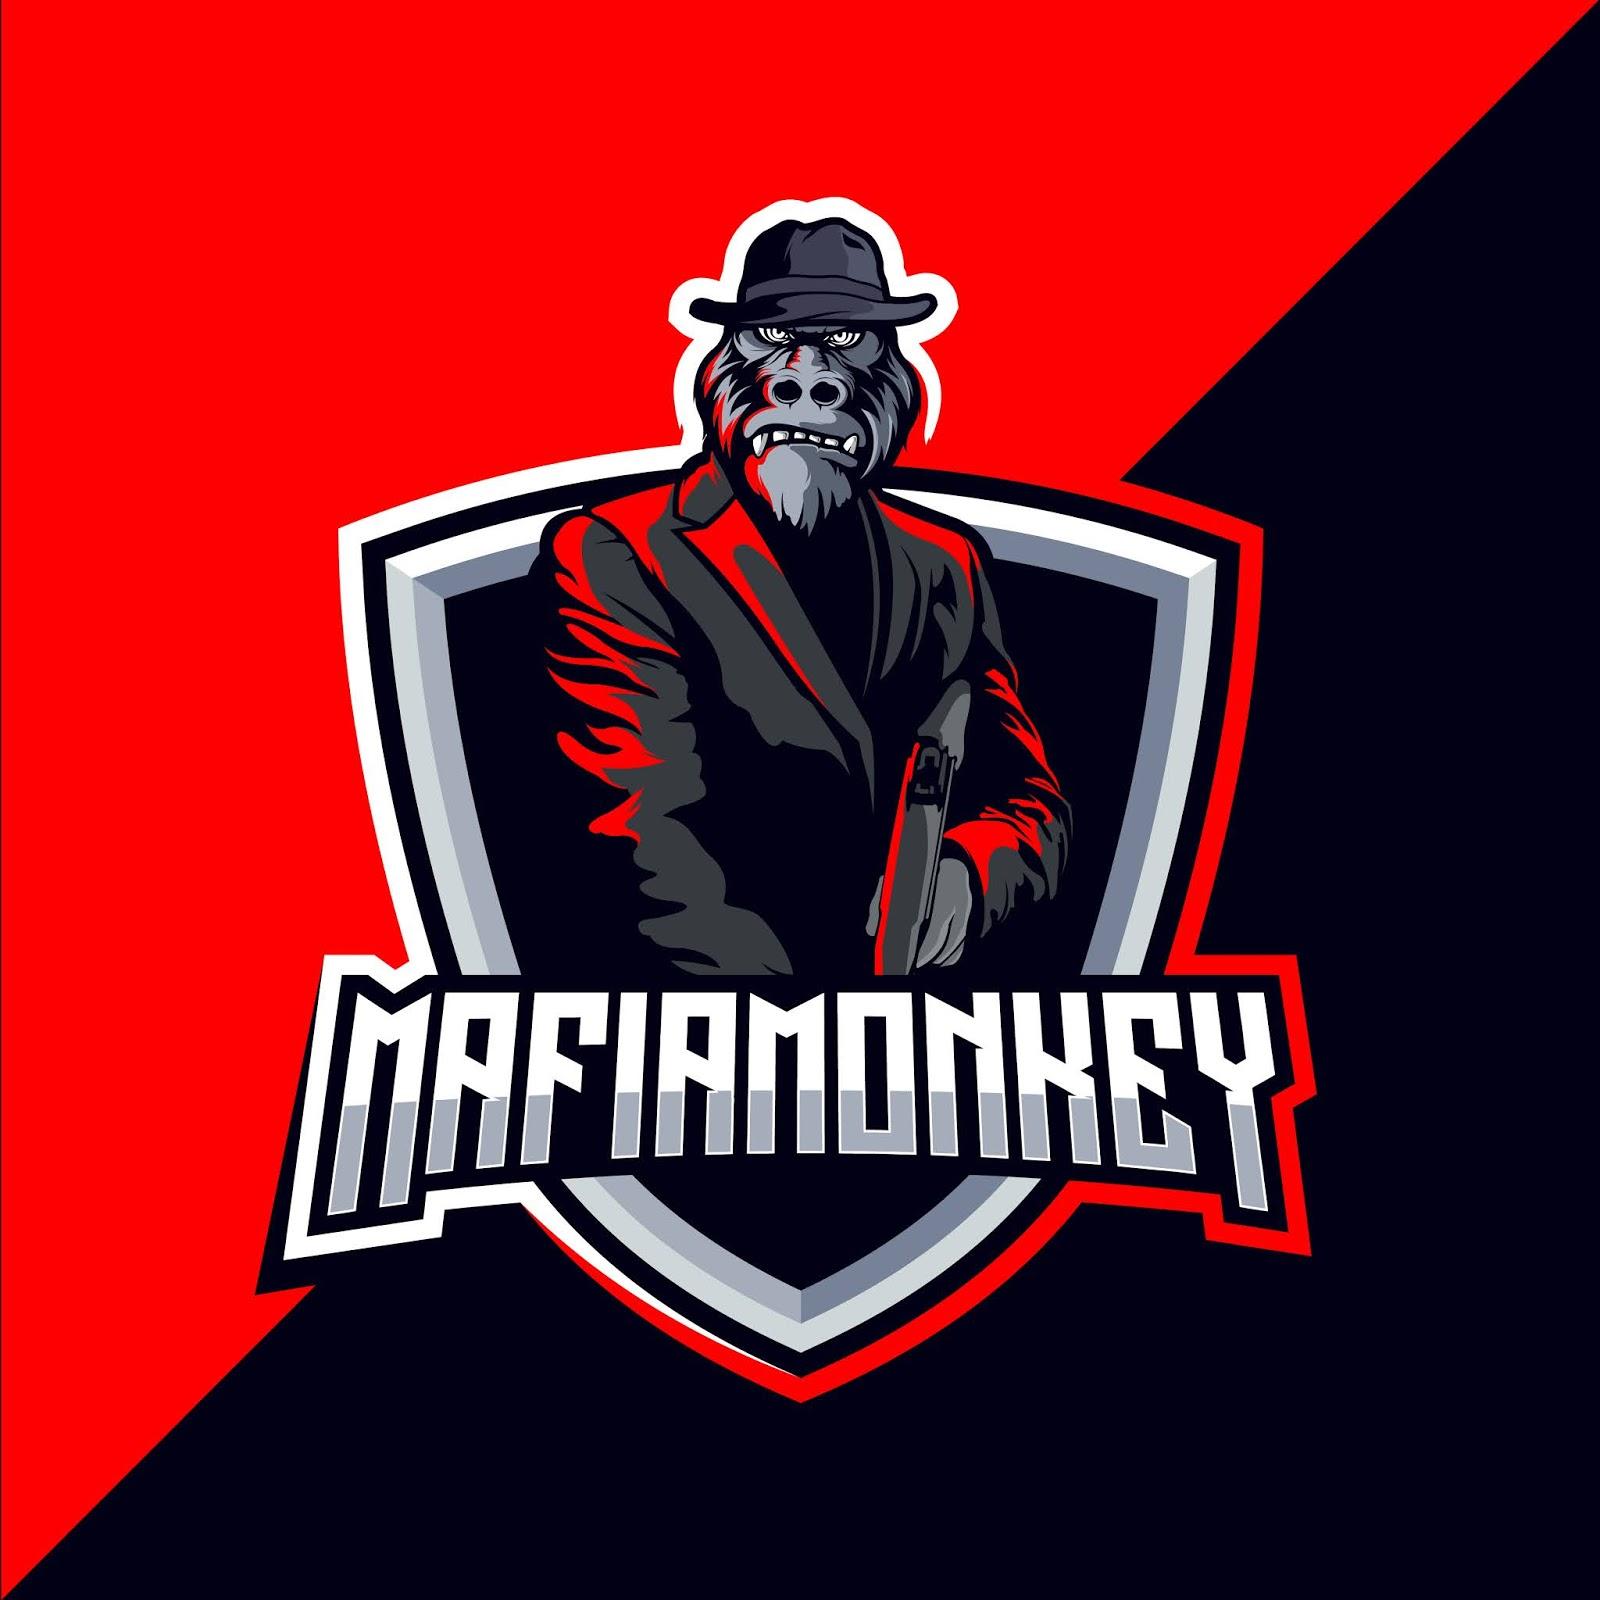 Mafia Gorilla Esport Gaming Mascot Logo Free Download Vector CDR, AI, EPS and PNG Formats